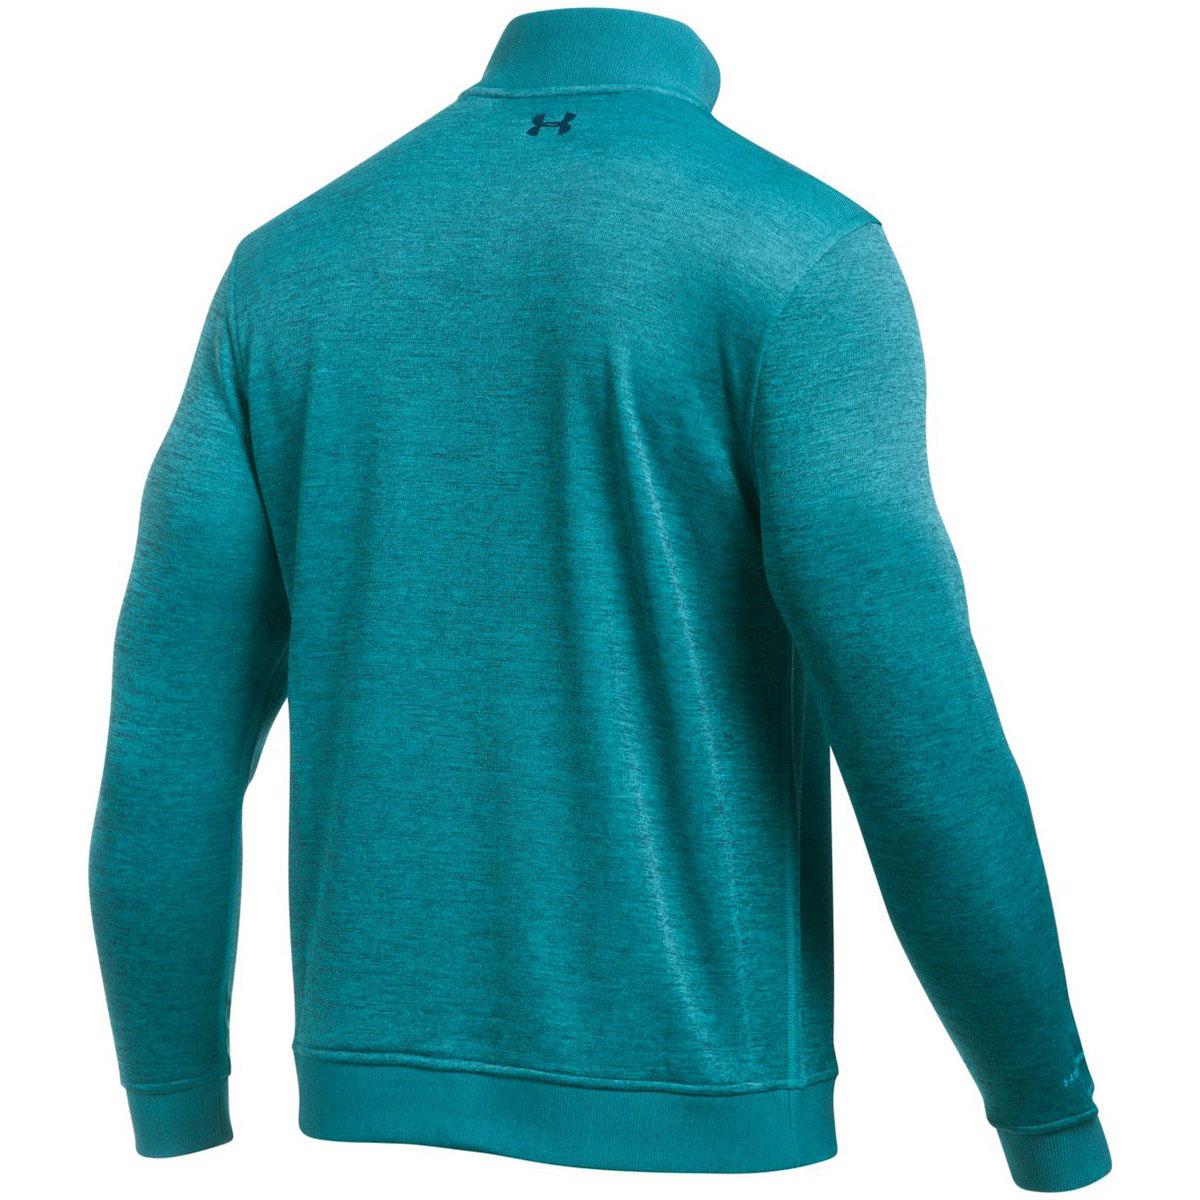 Under-Armour-Mens-UA-Storm-Sweater-Fleece-1-4-Zip-Pullover-Jumper-25-OFF-RRP thumbnail 22